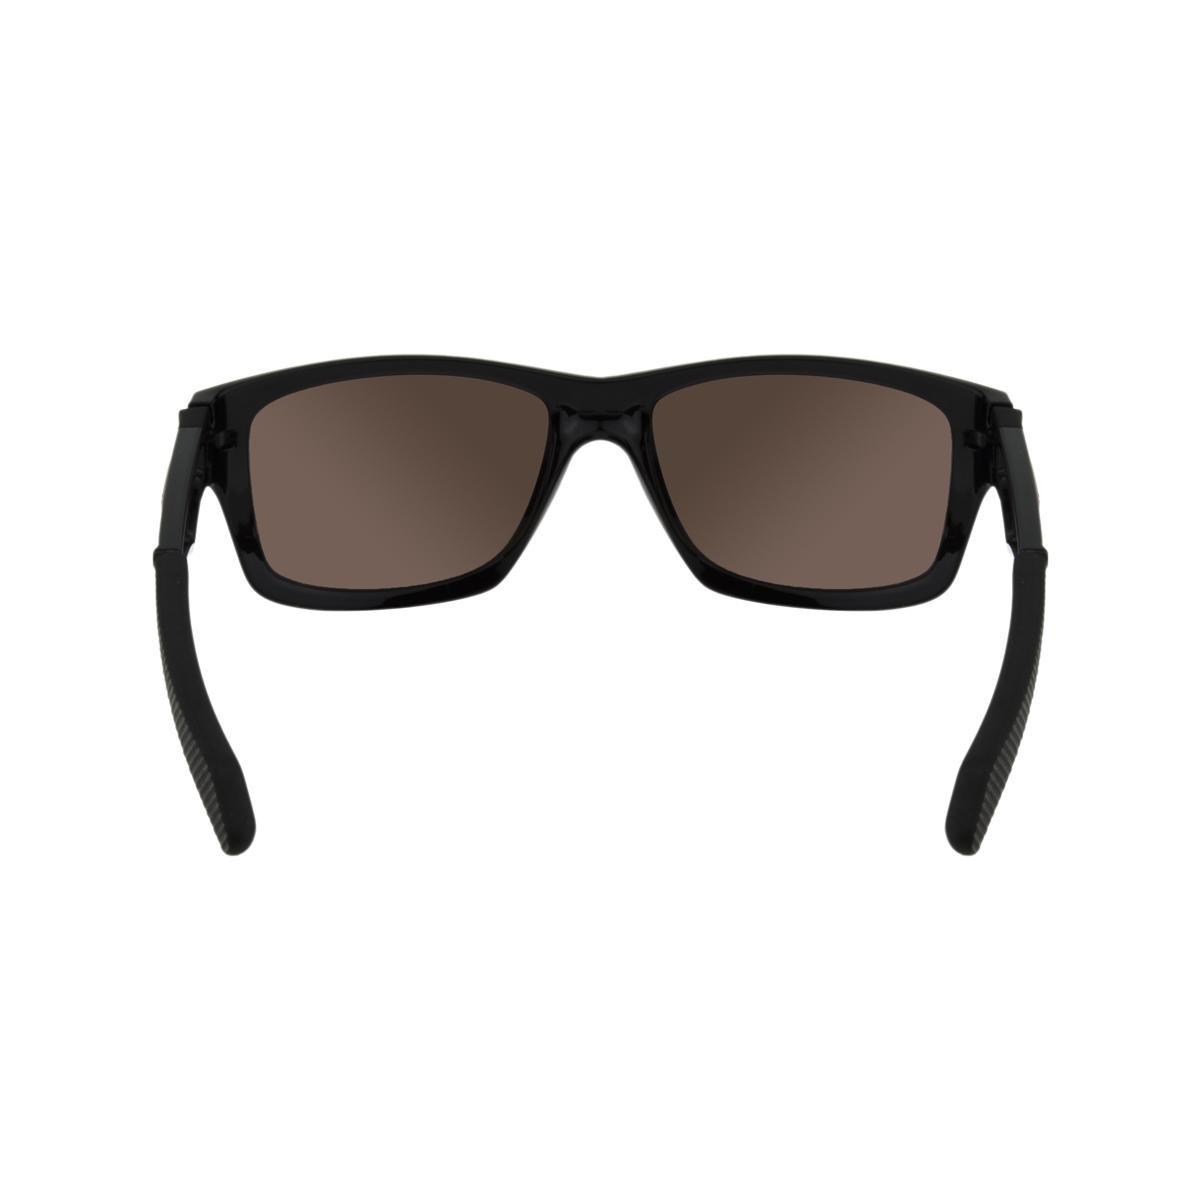 ff2f96d7b5cf9 ... Óculos de Sol Oakley Jupiter Squared OO9135P - Black Ink Red Iridium  Polarized